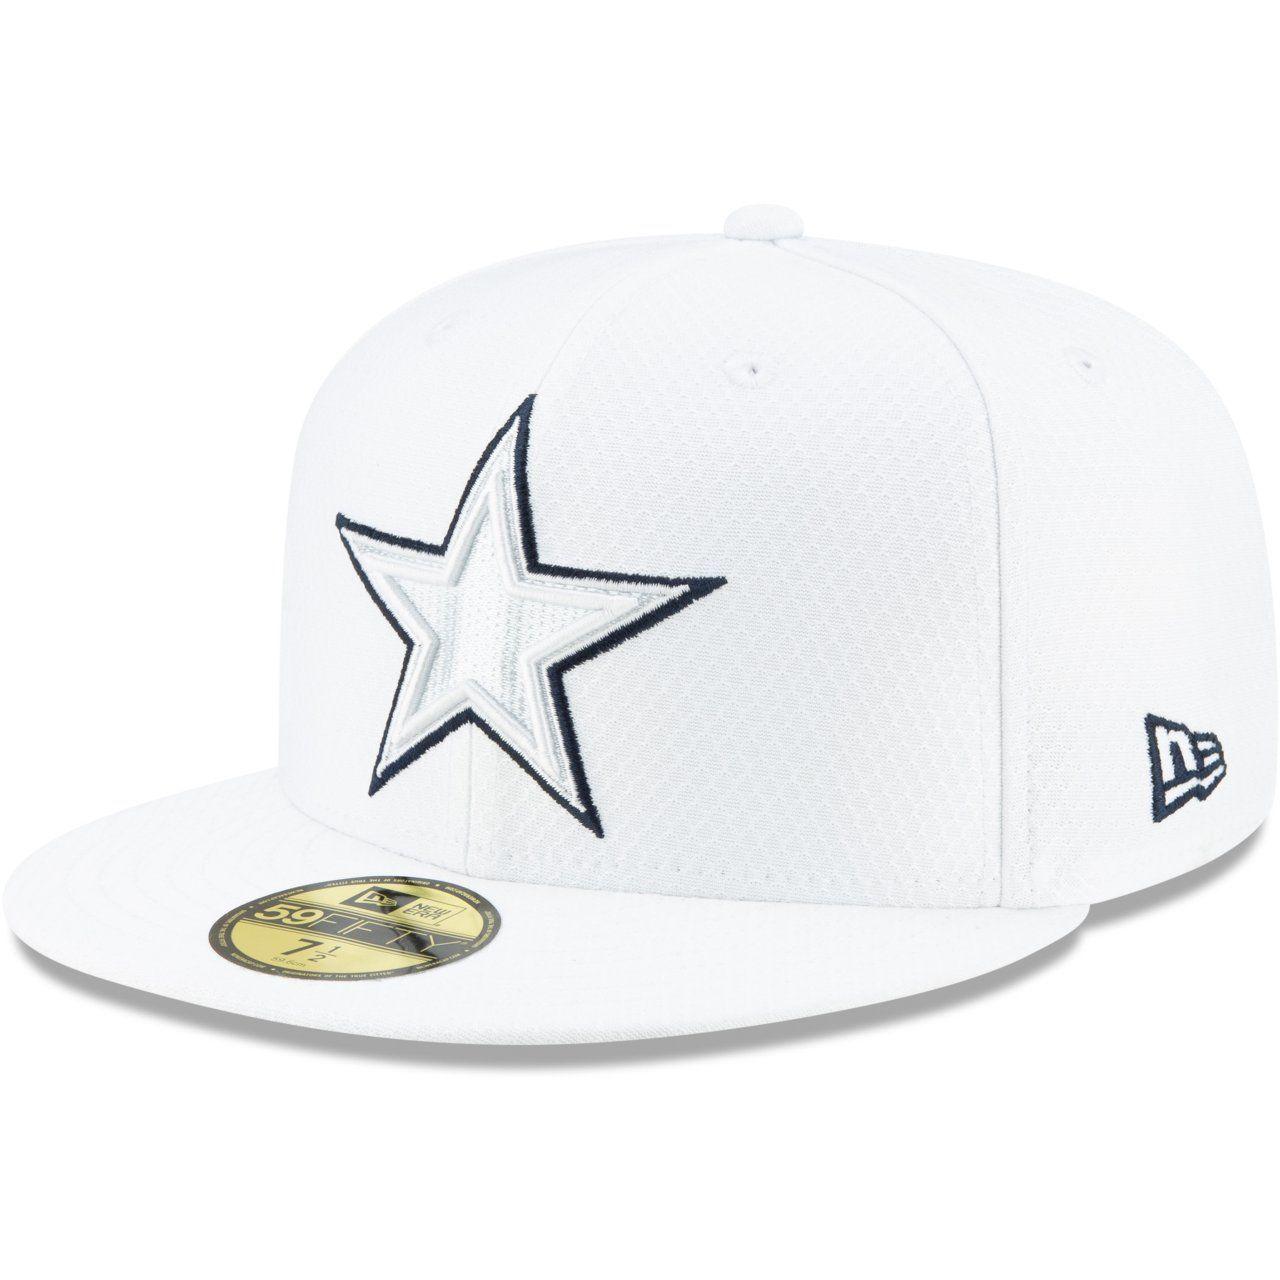 amfoo - New Era 59Fifty Cap - PLATINUM Sideline NFL Dallas Cowboys